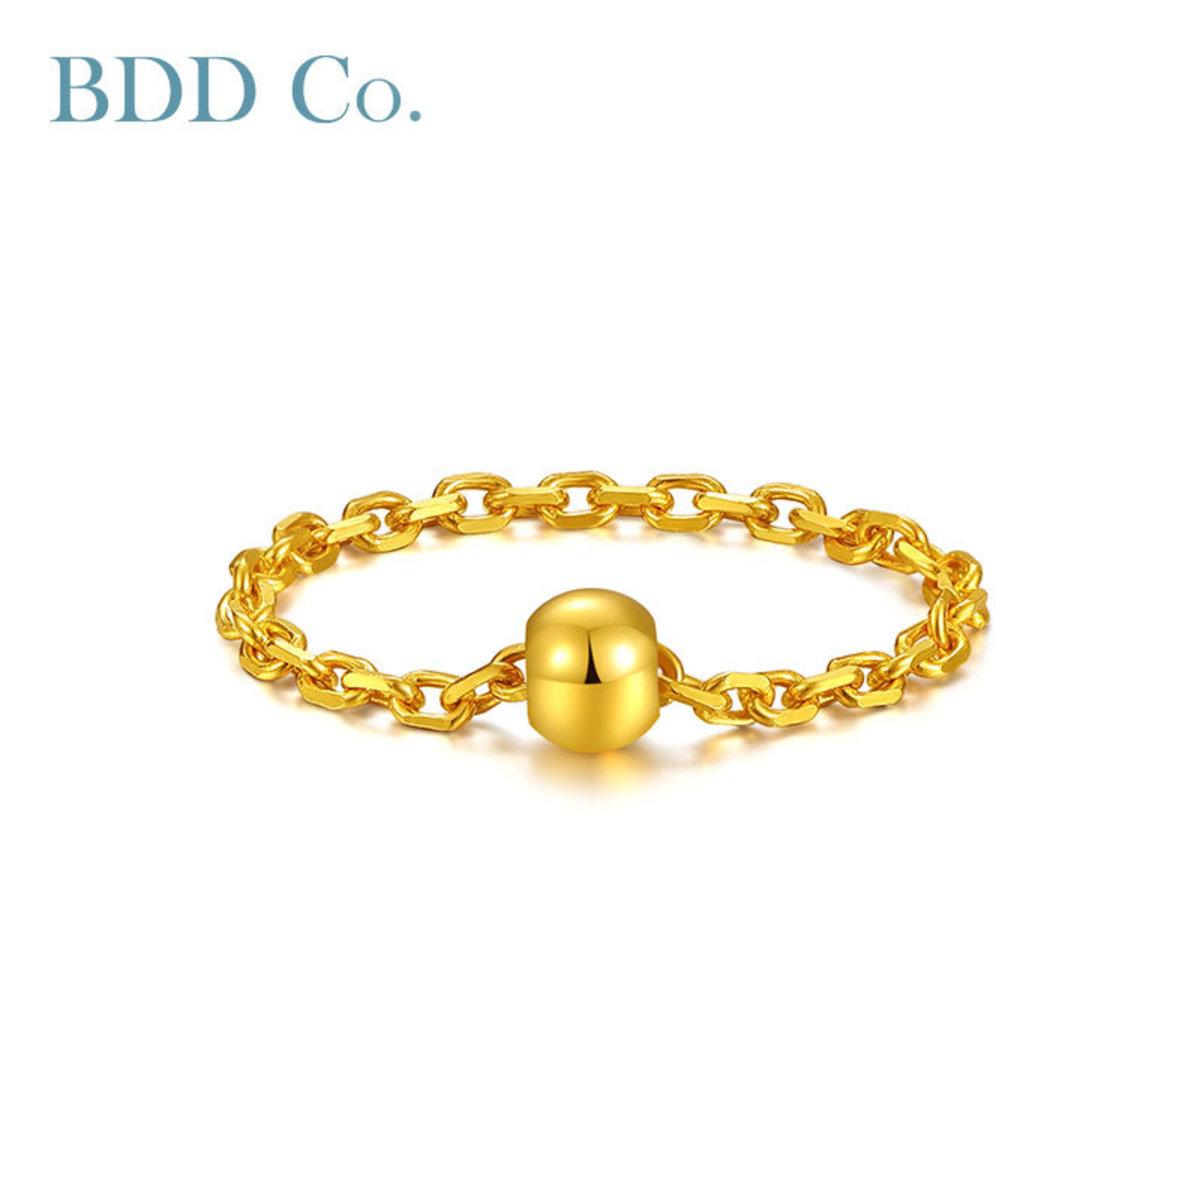 【BDD-Co.】黃金耳環 足金鏈條轉運珠戒指女戒